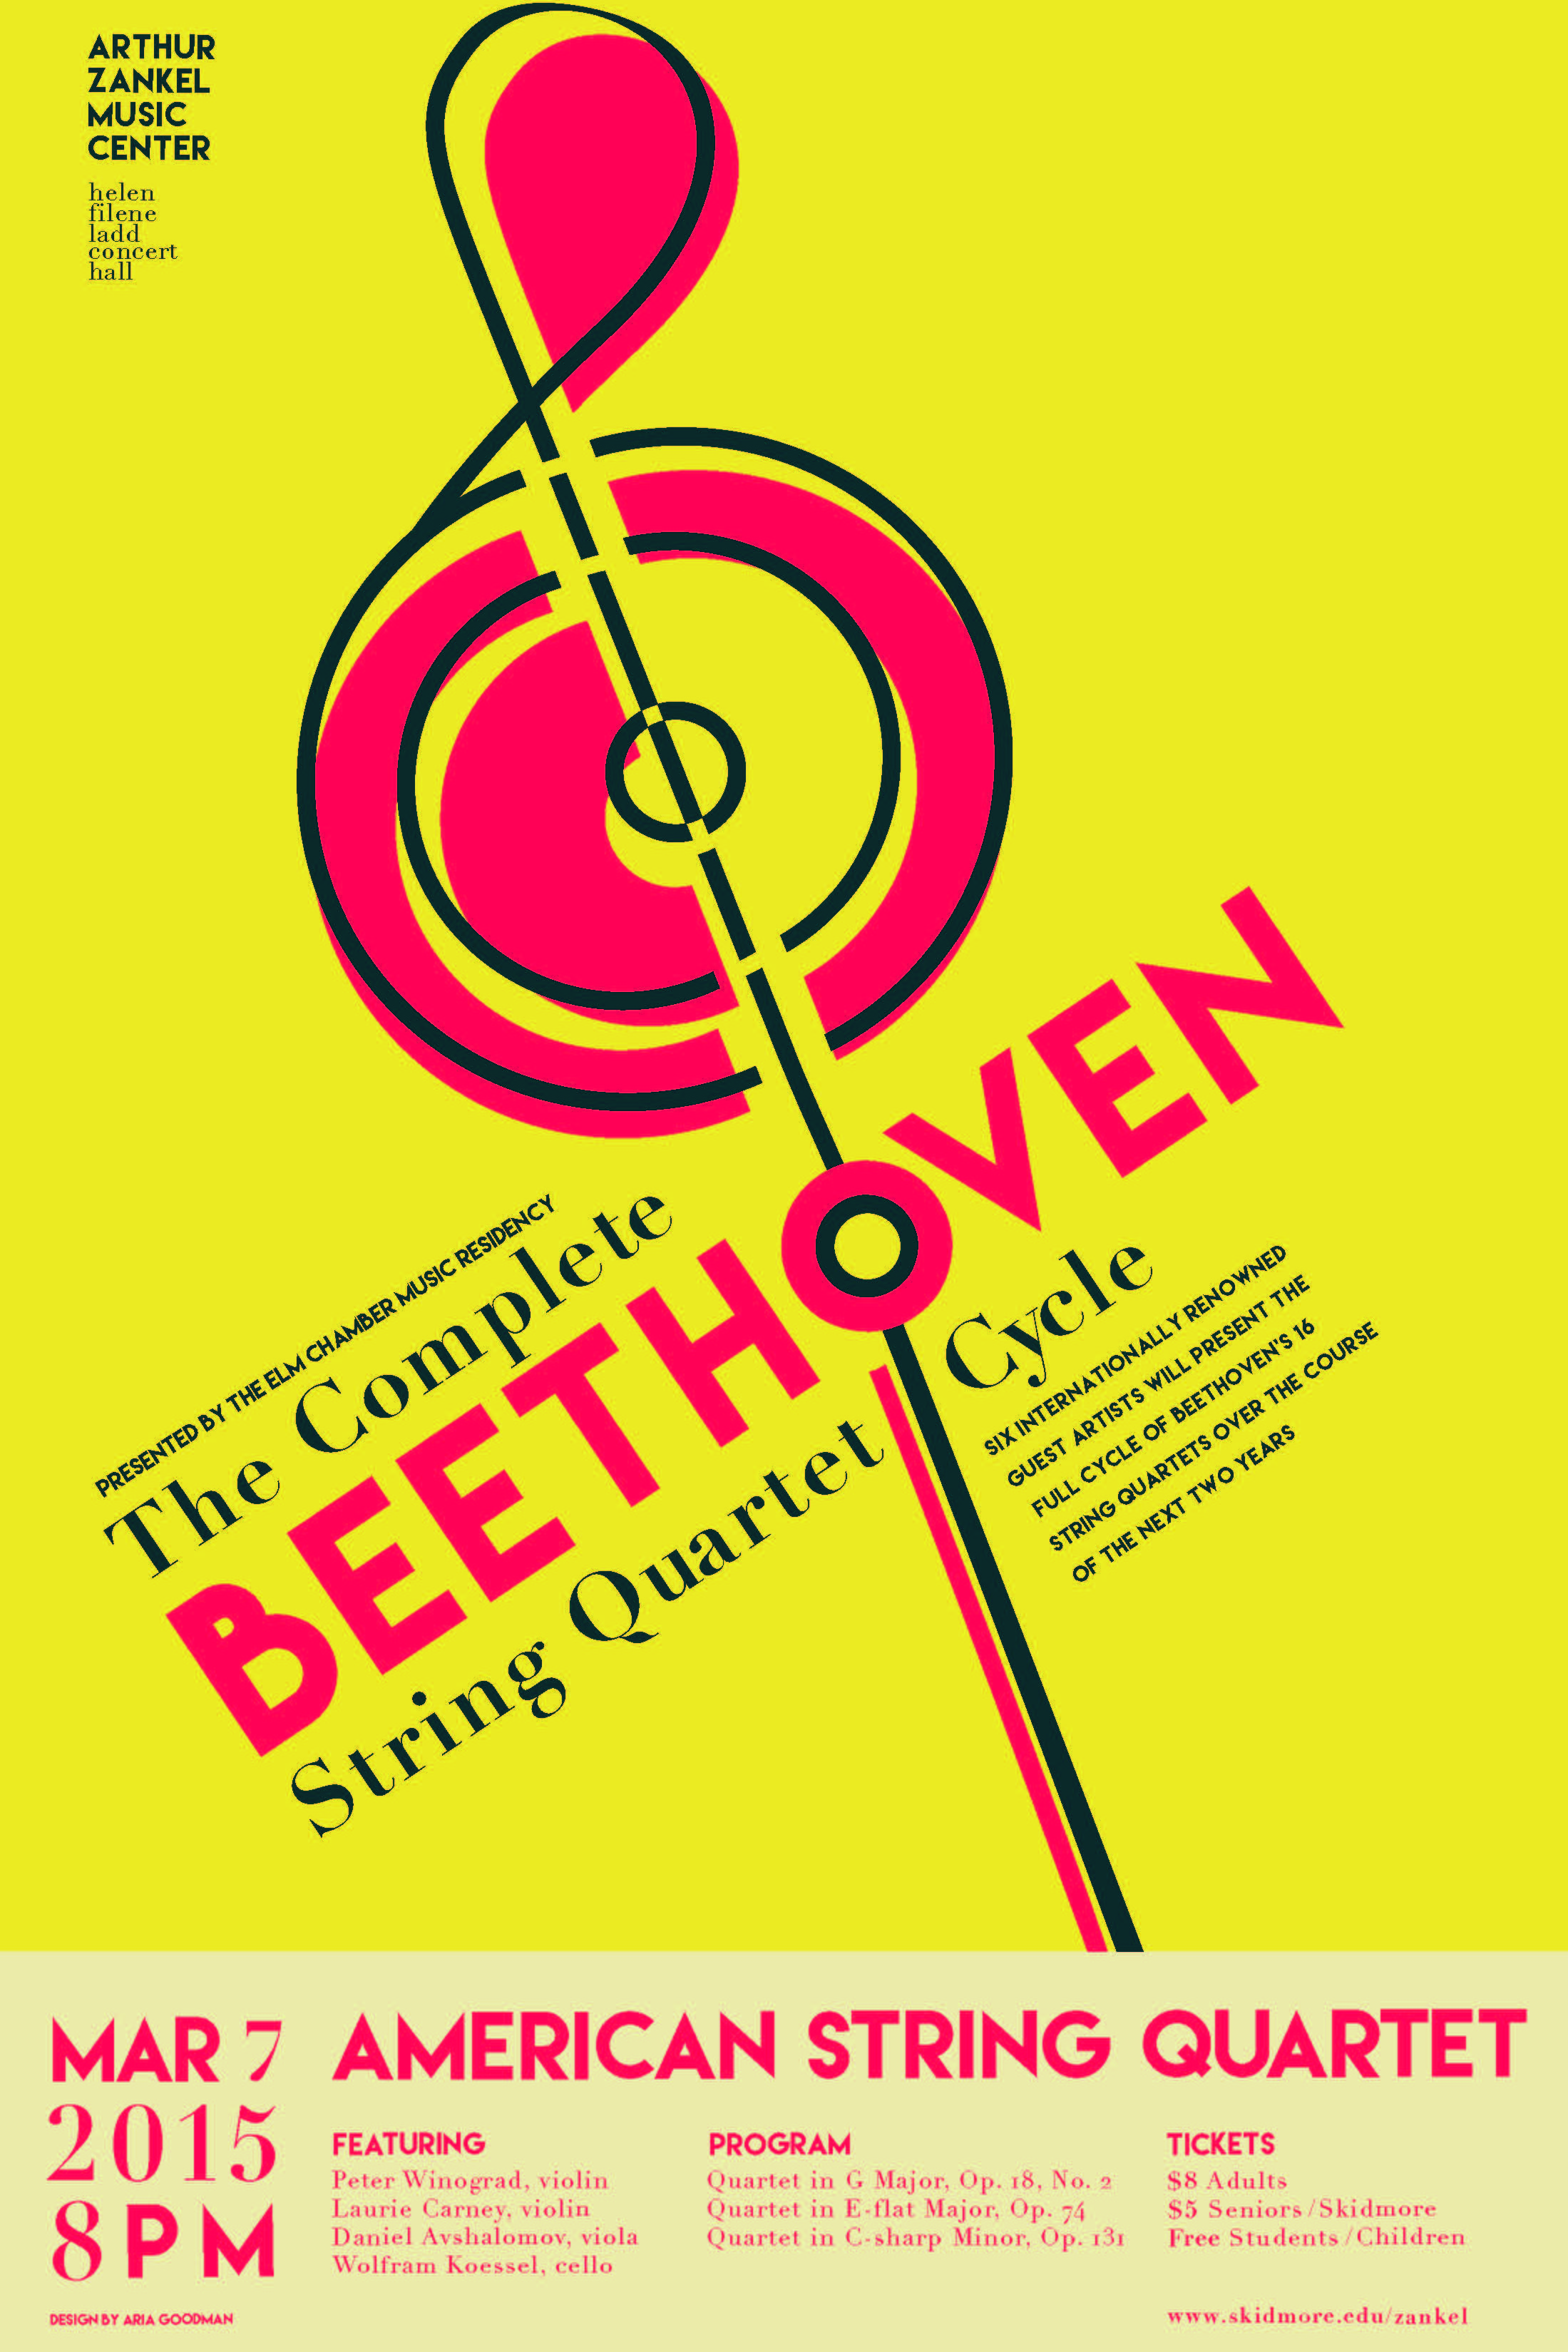 3/7/15 American String Quartet on Livestream